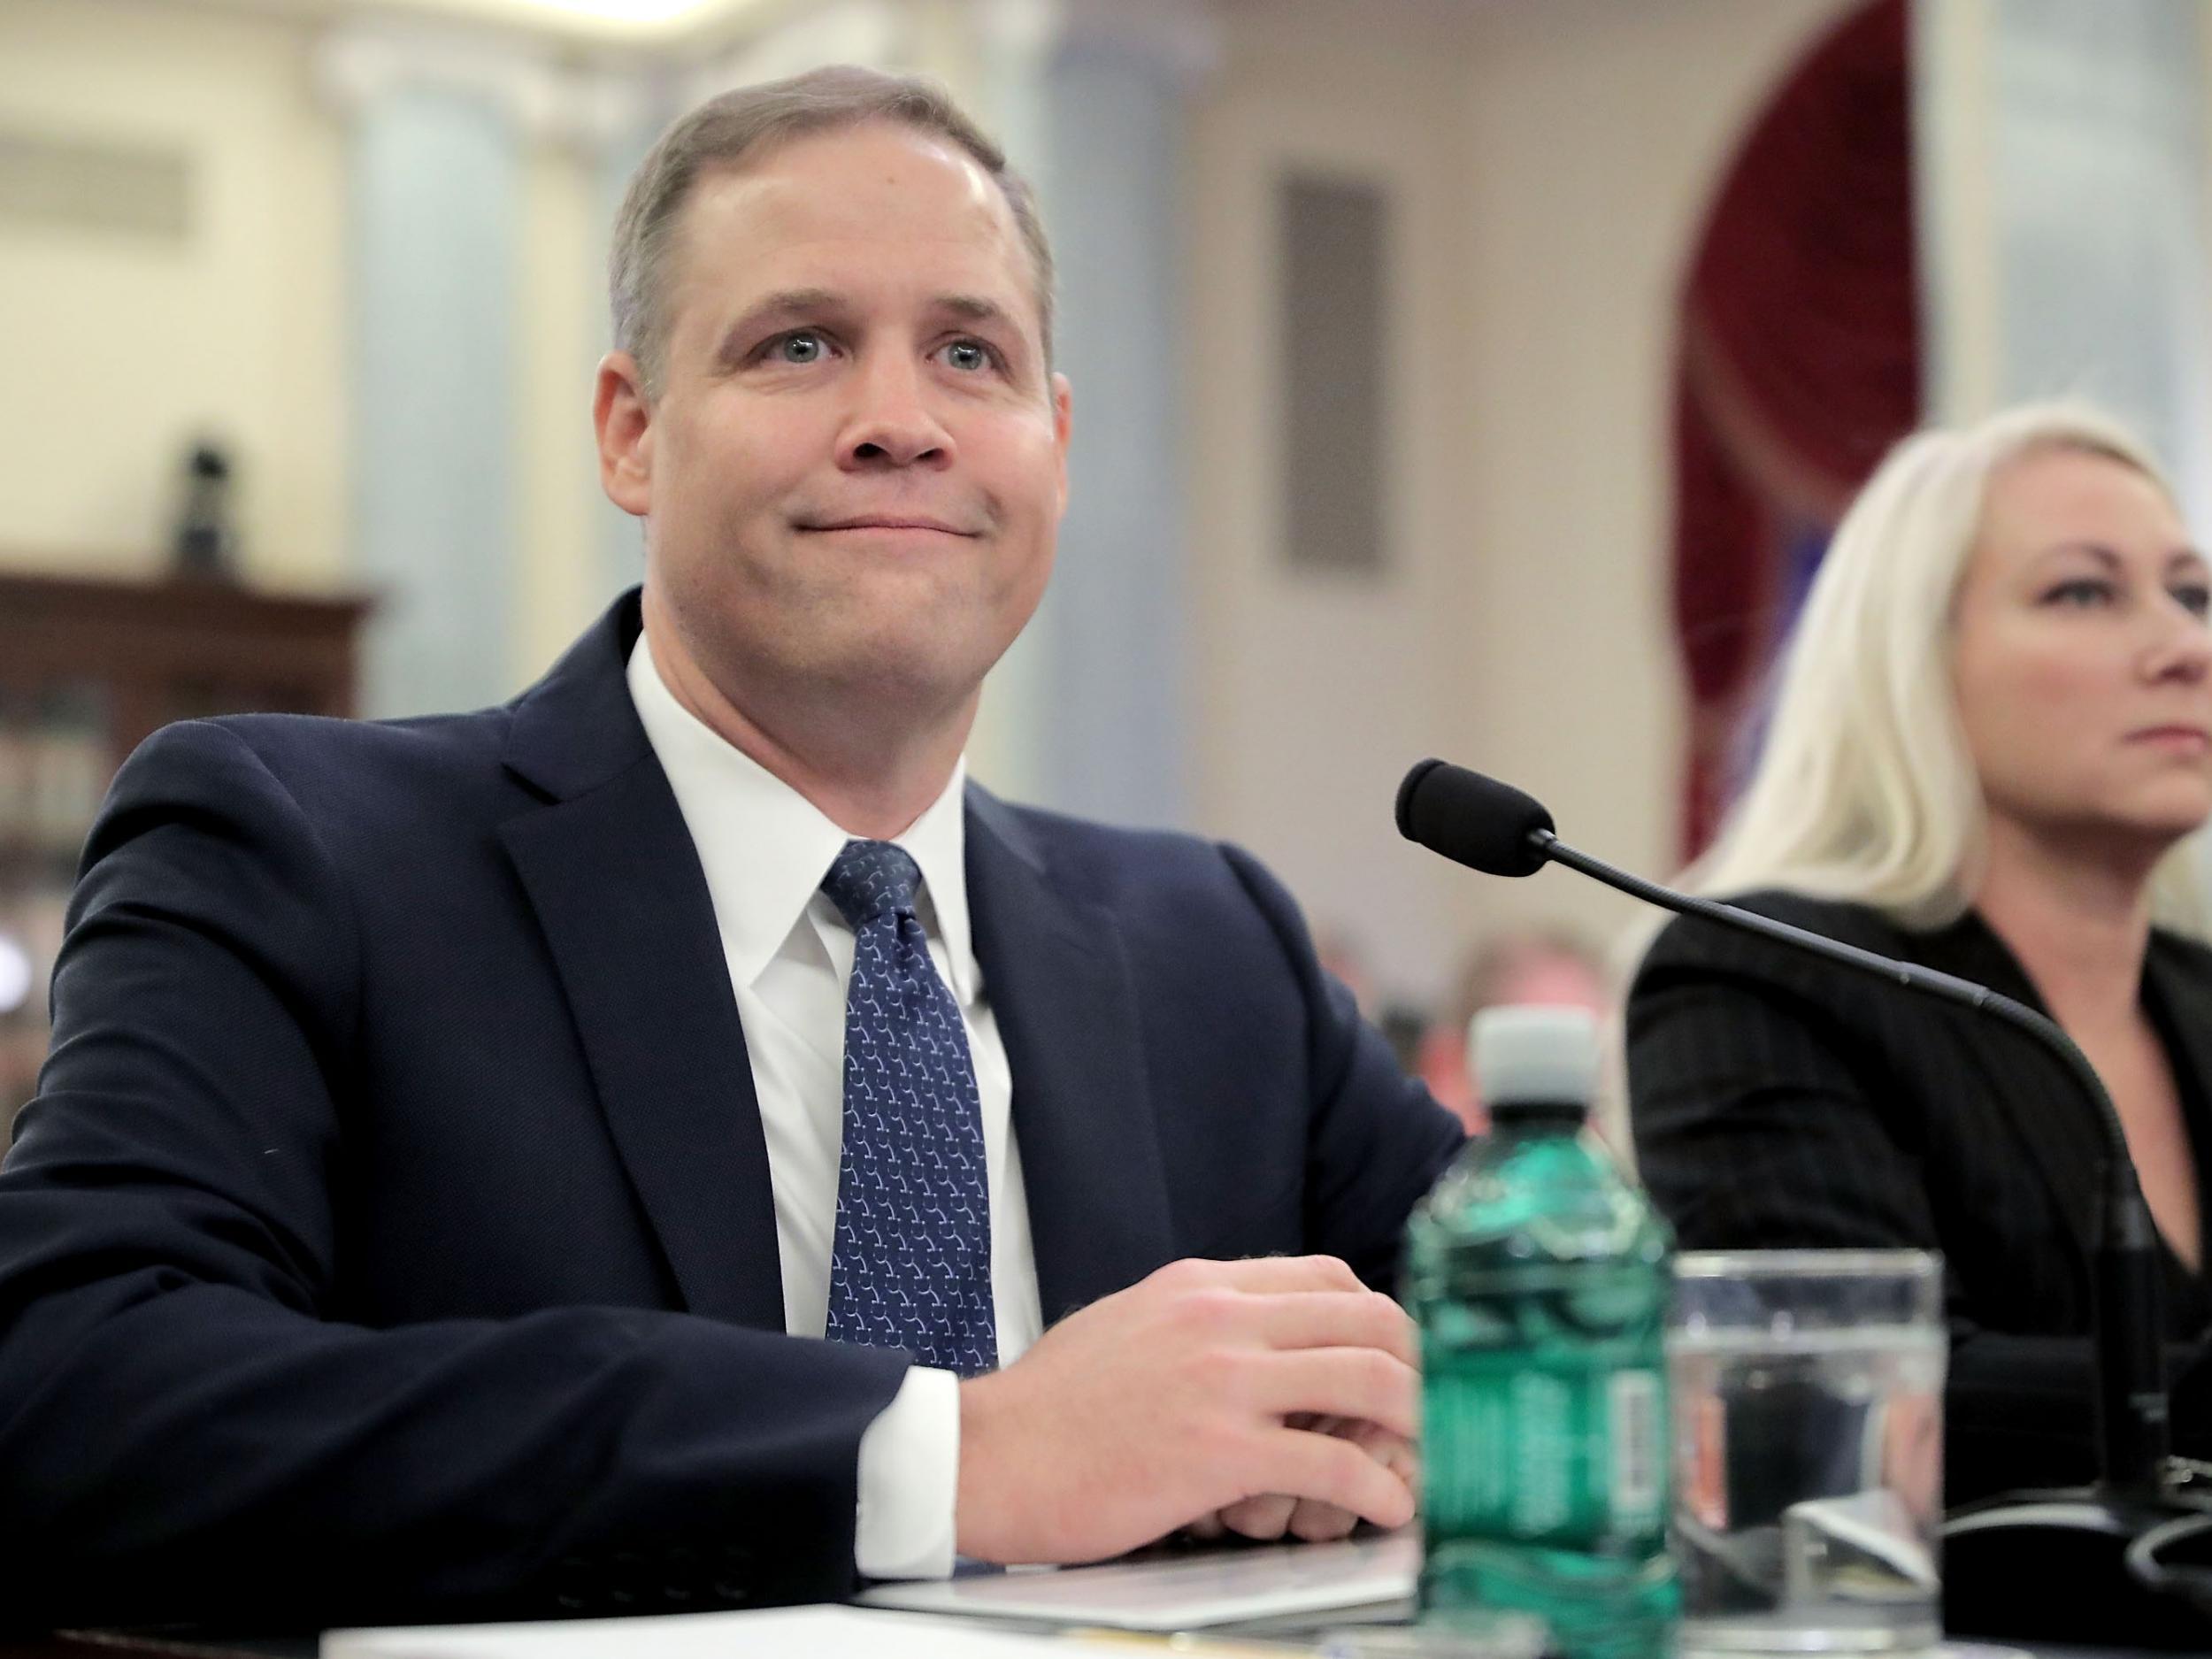 Trump's new Nasa chief Jim Bridenstine is a 'climate change denier' who could make 'terrifying' decisions, US senators warn